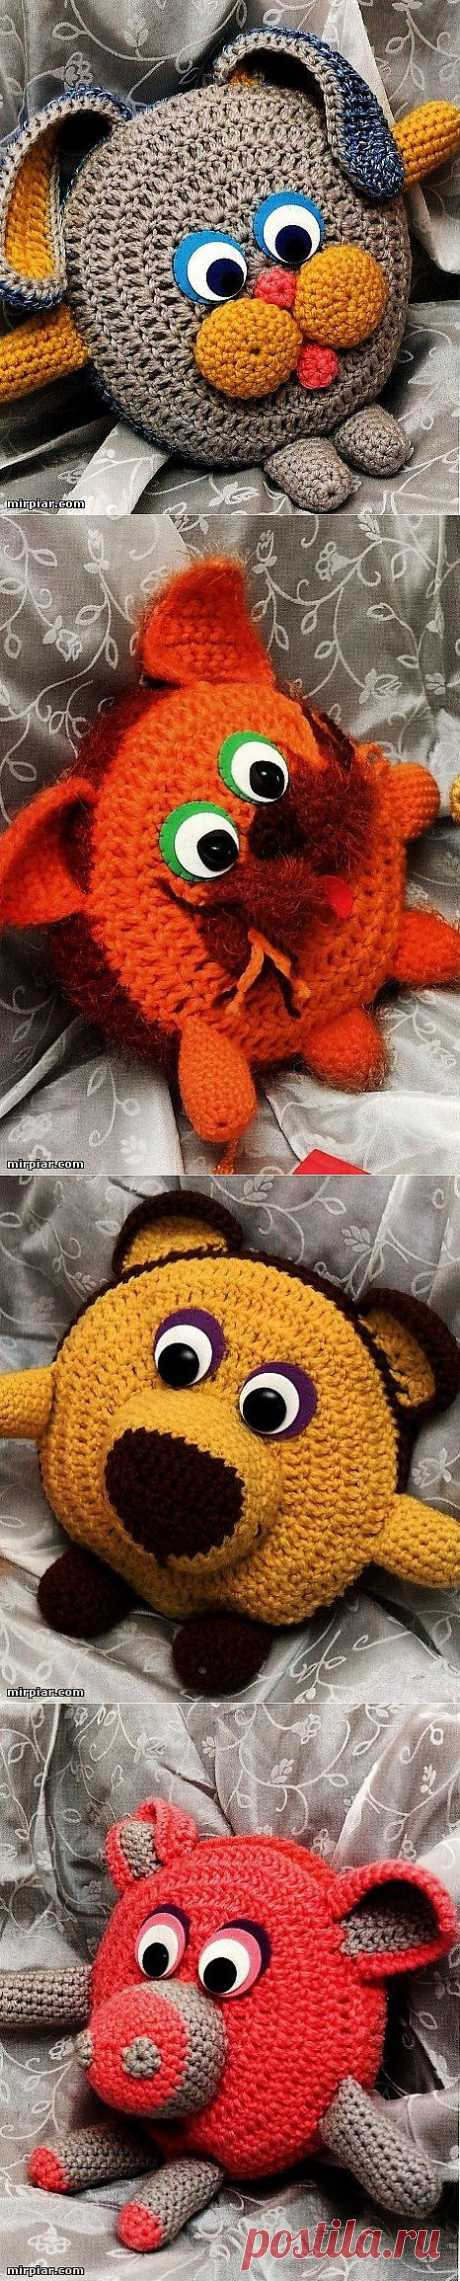 Игрушки - подушки в детскую комнату.